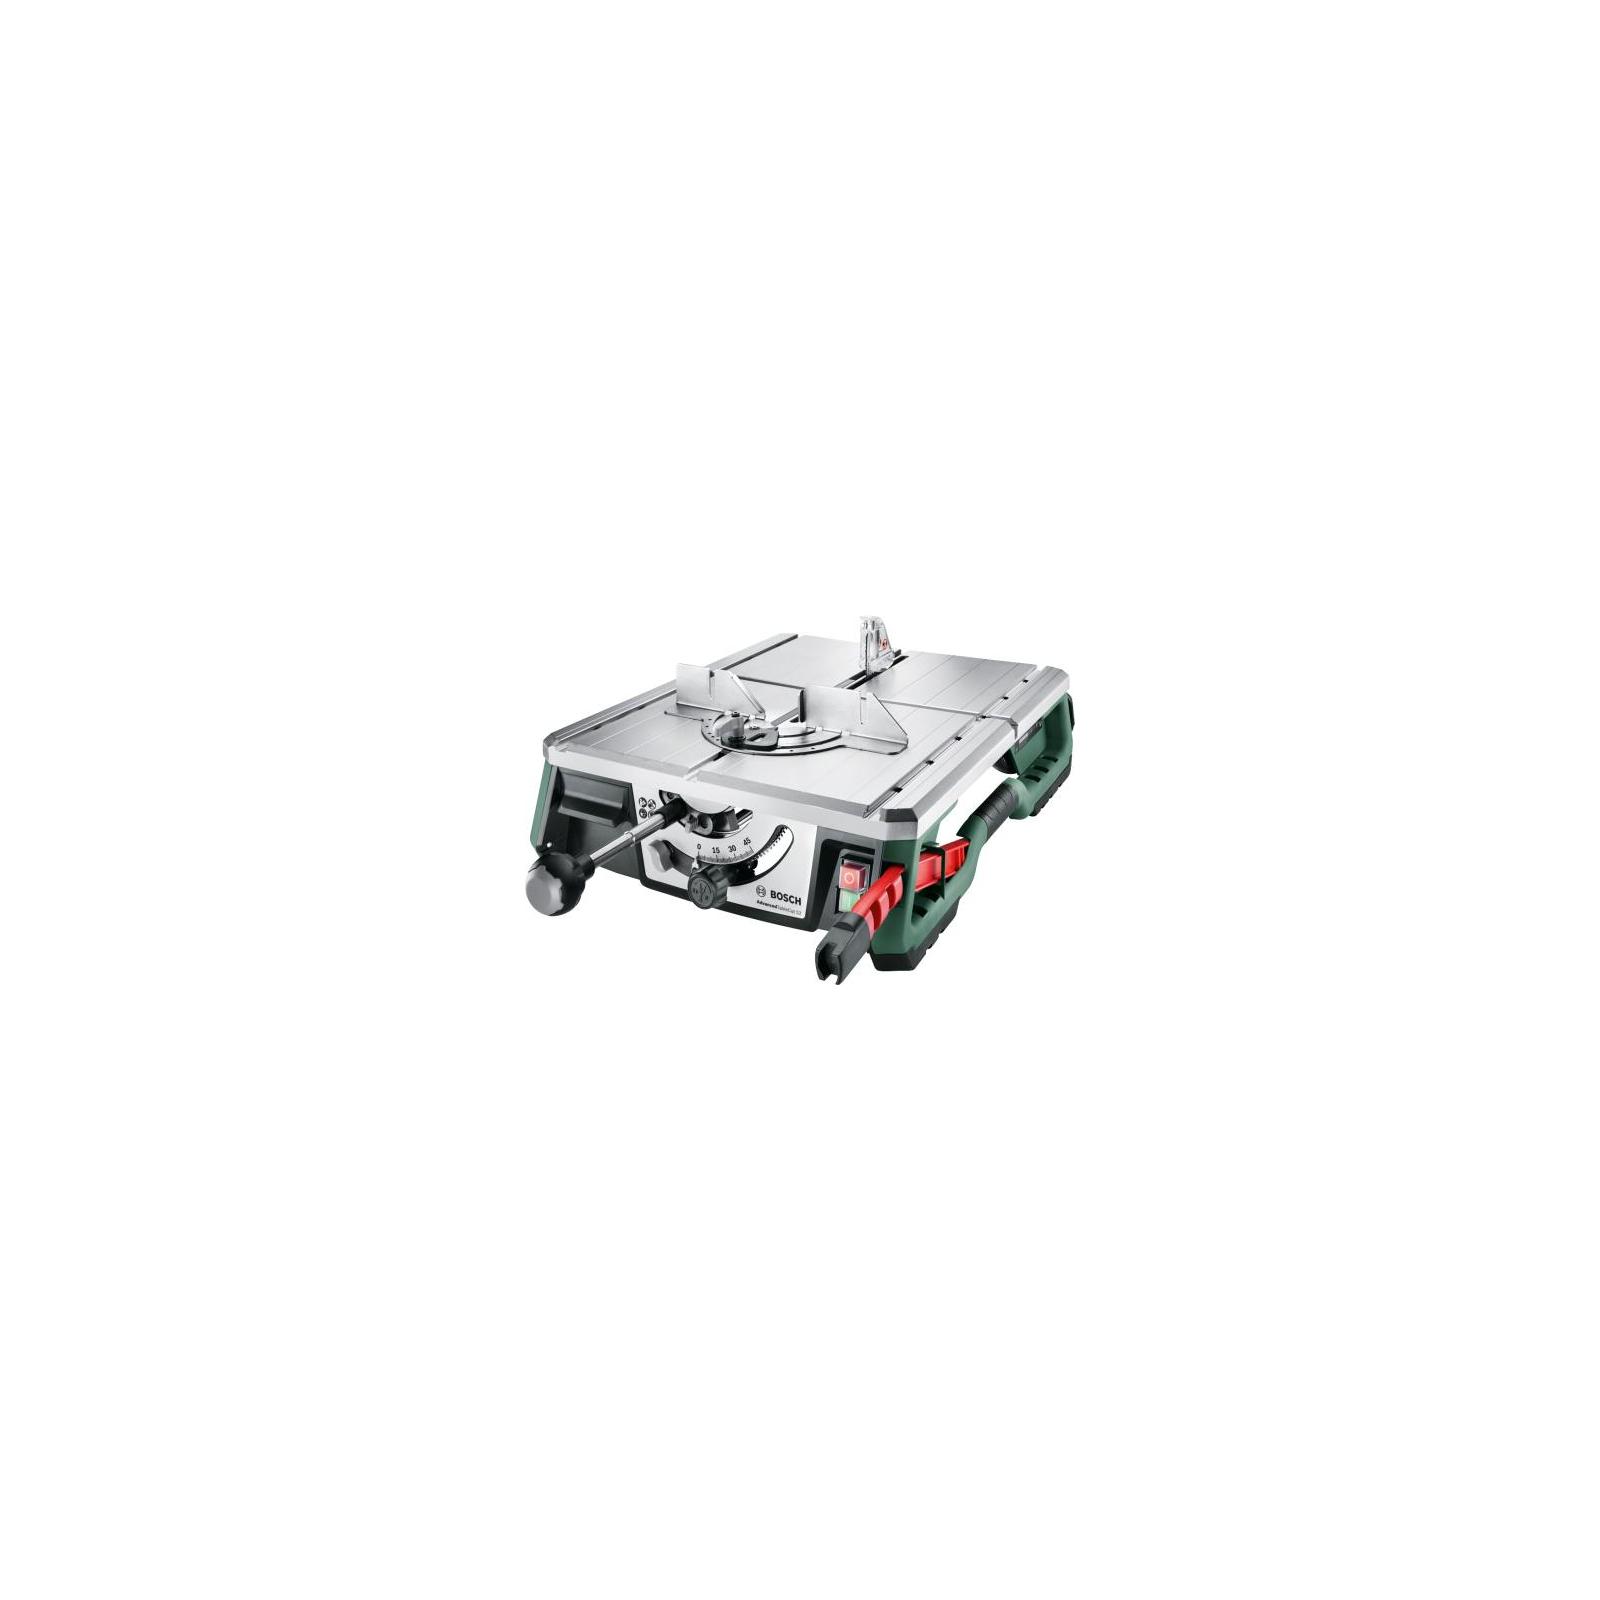 Дискова пила Bosch AdvancedTableCut 52, стационарная (0.603.B12.000)